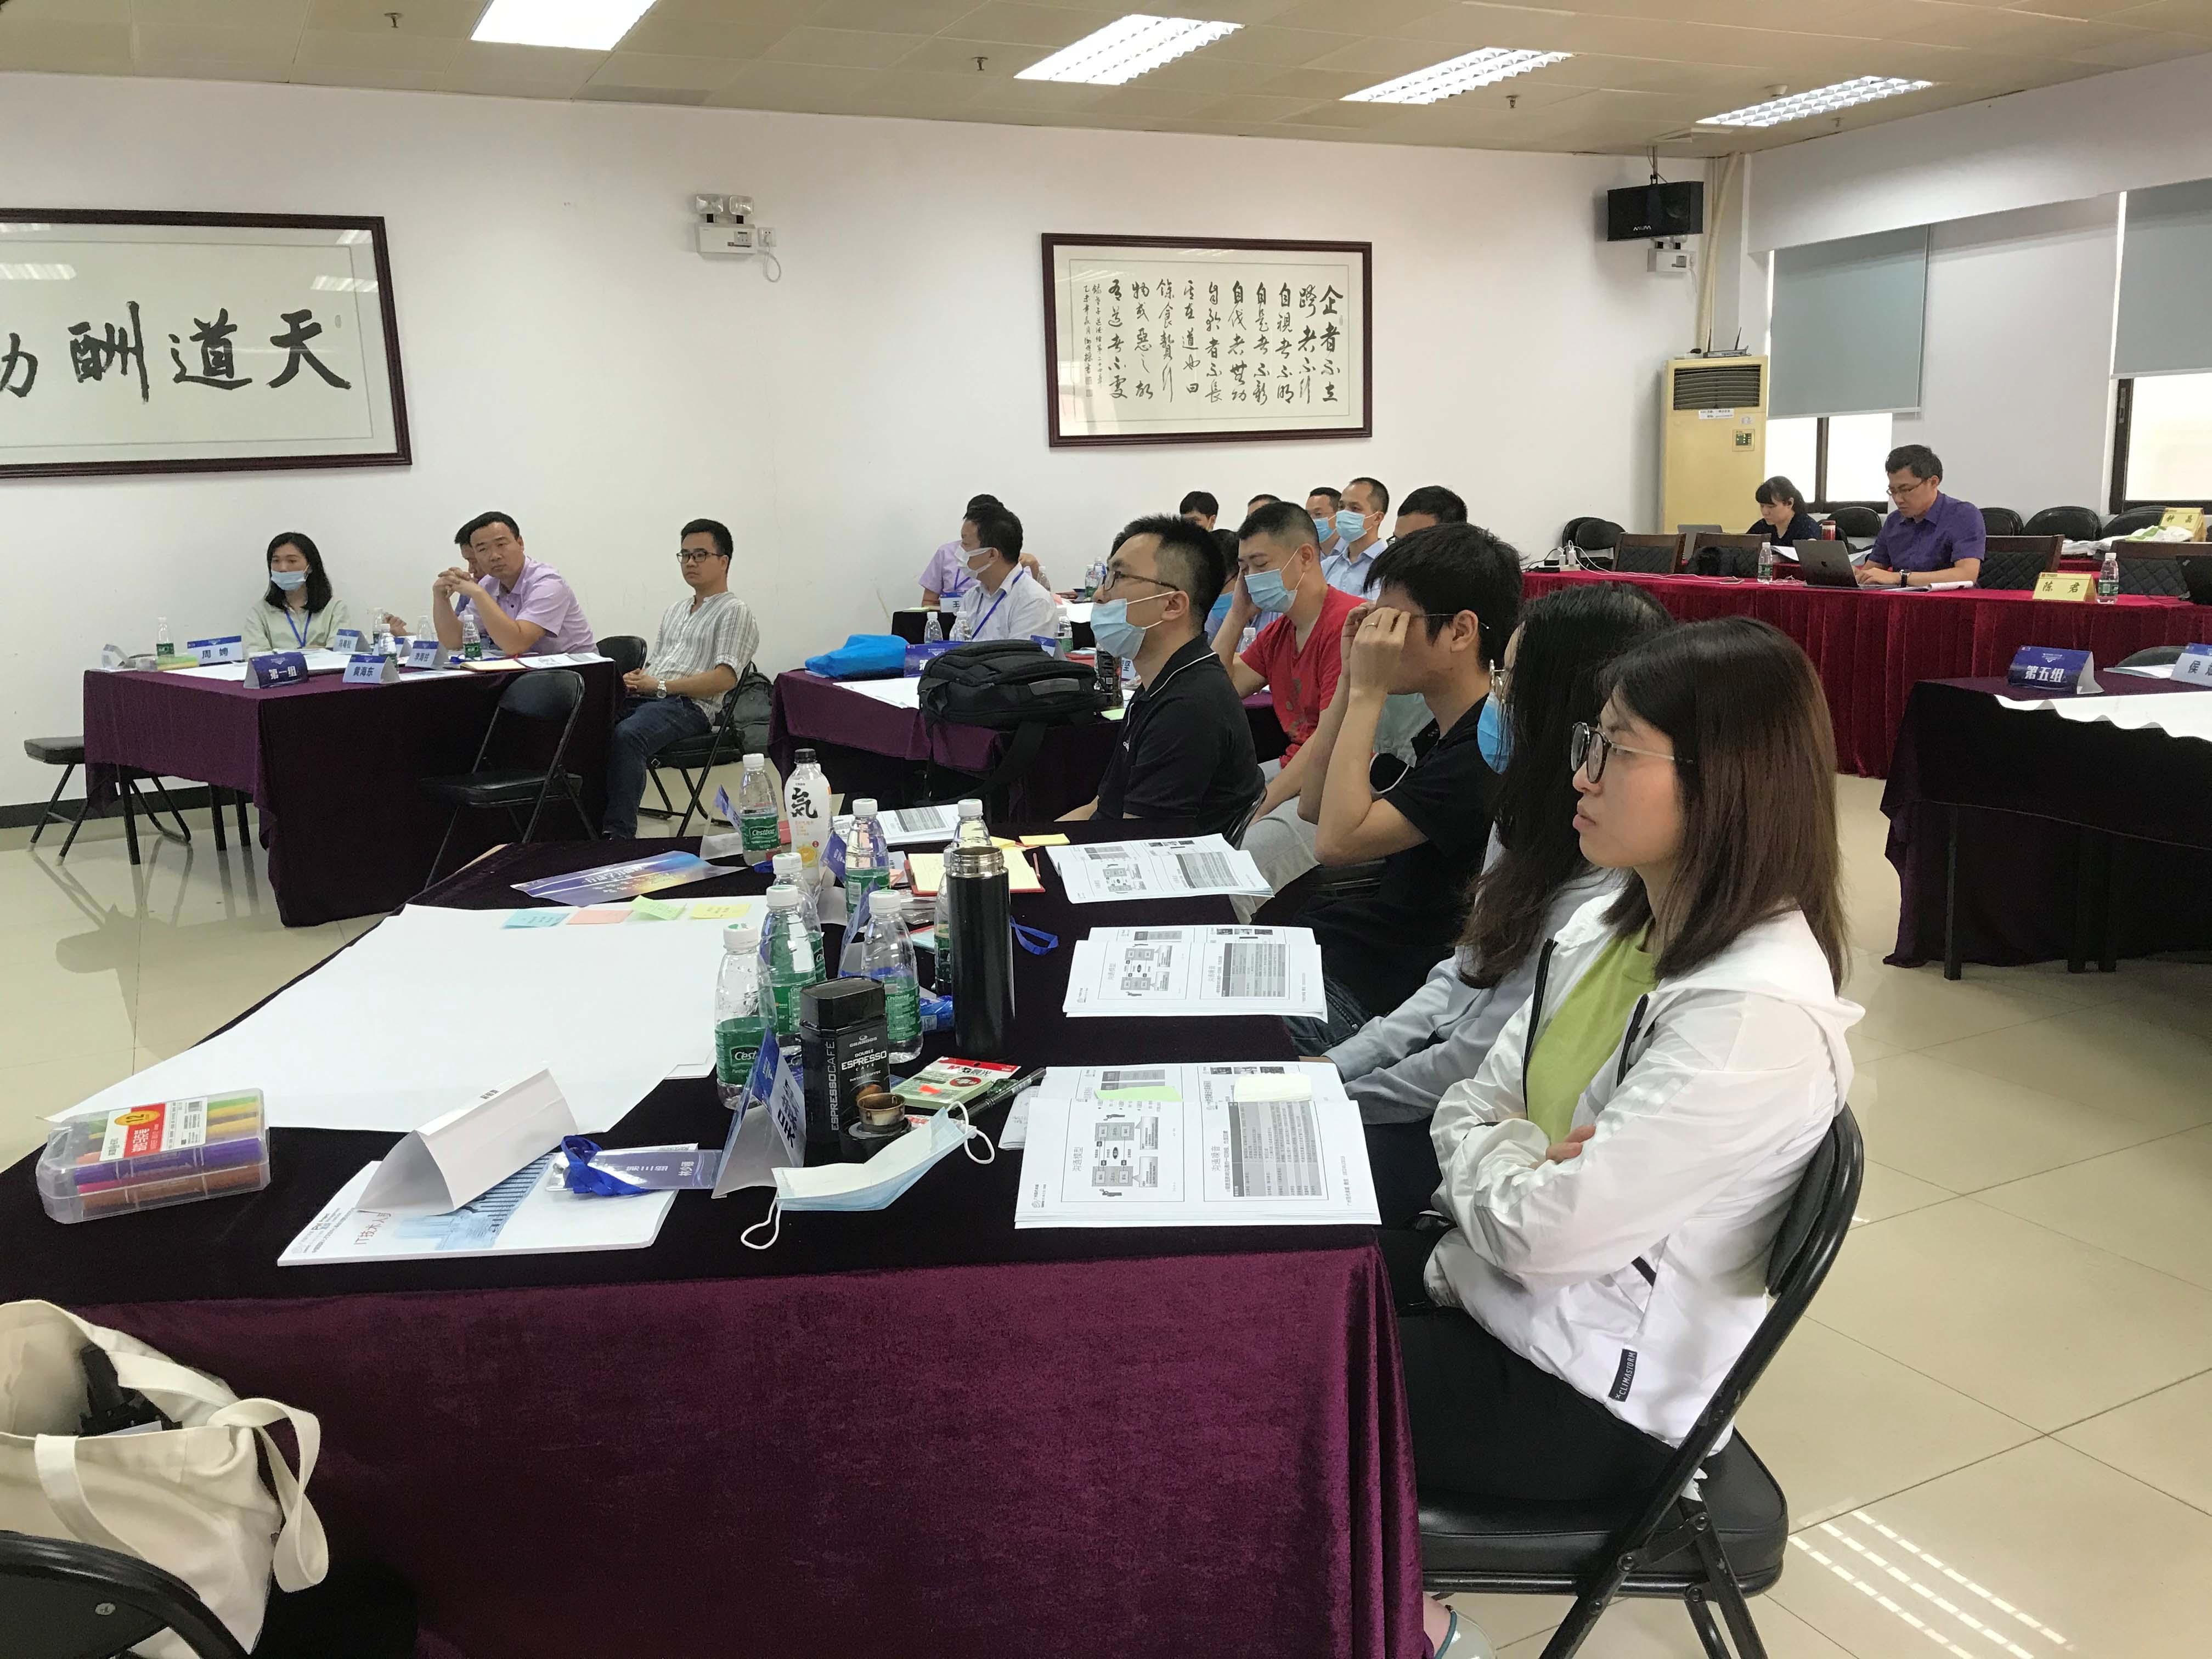 IT部门的技术人员的内部和外部跨部门沟通